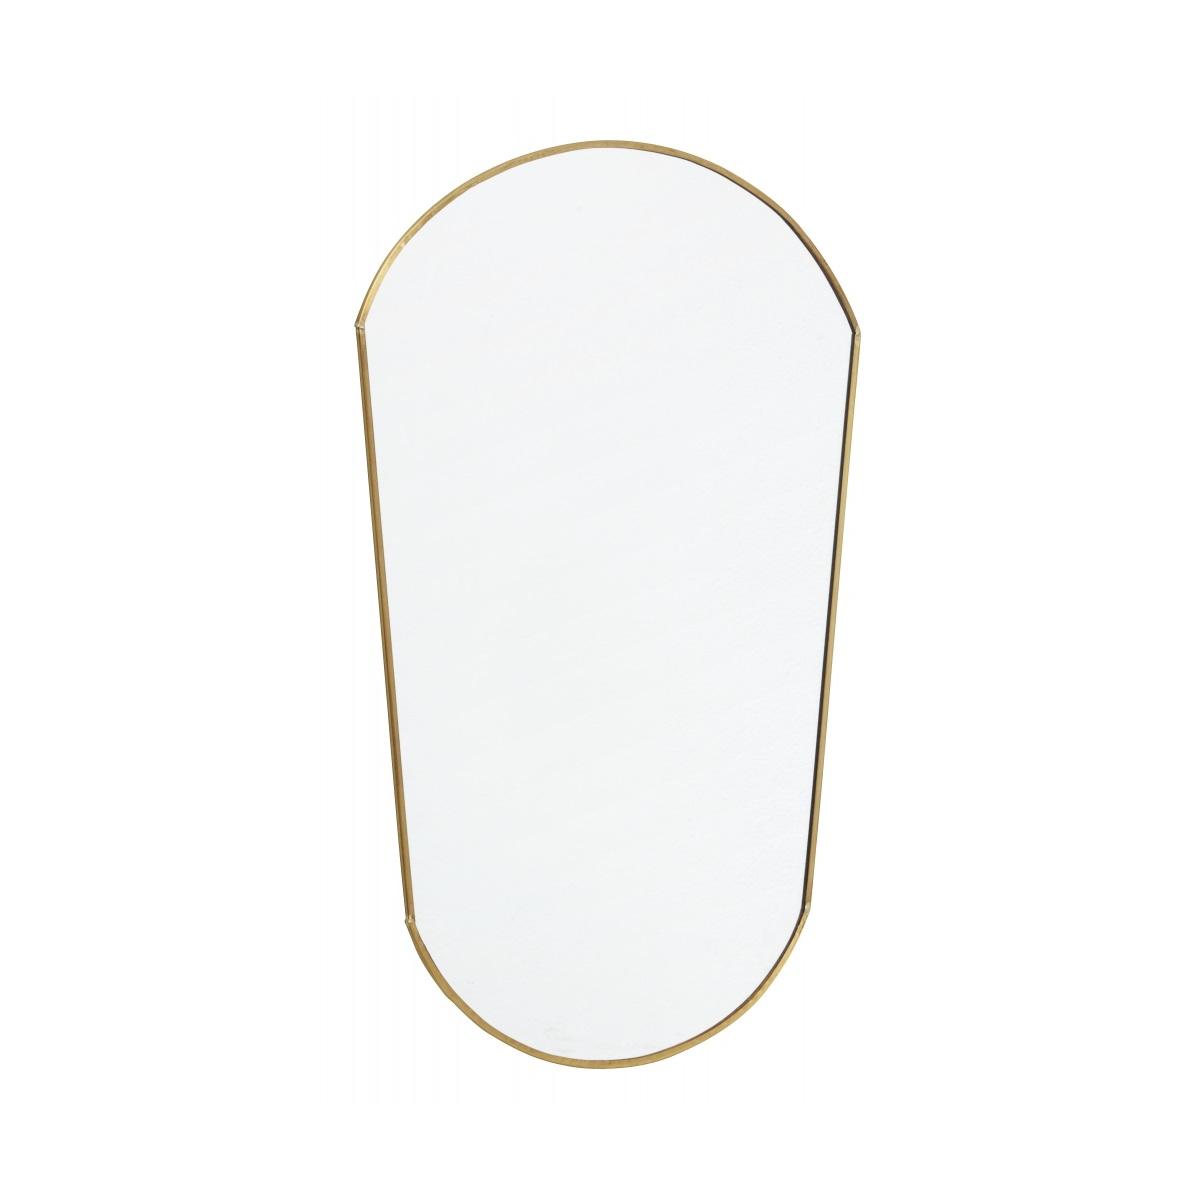 Oval spegel antik guld Nordal